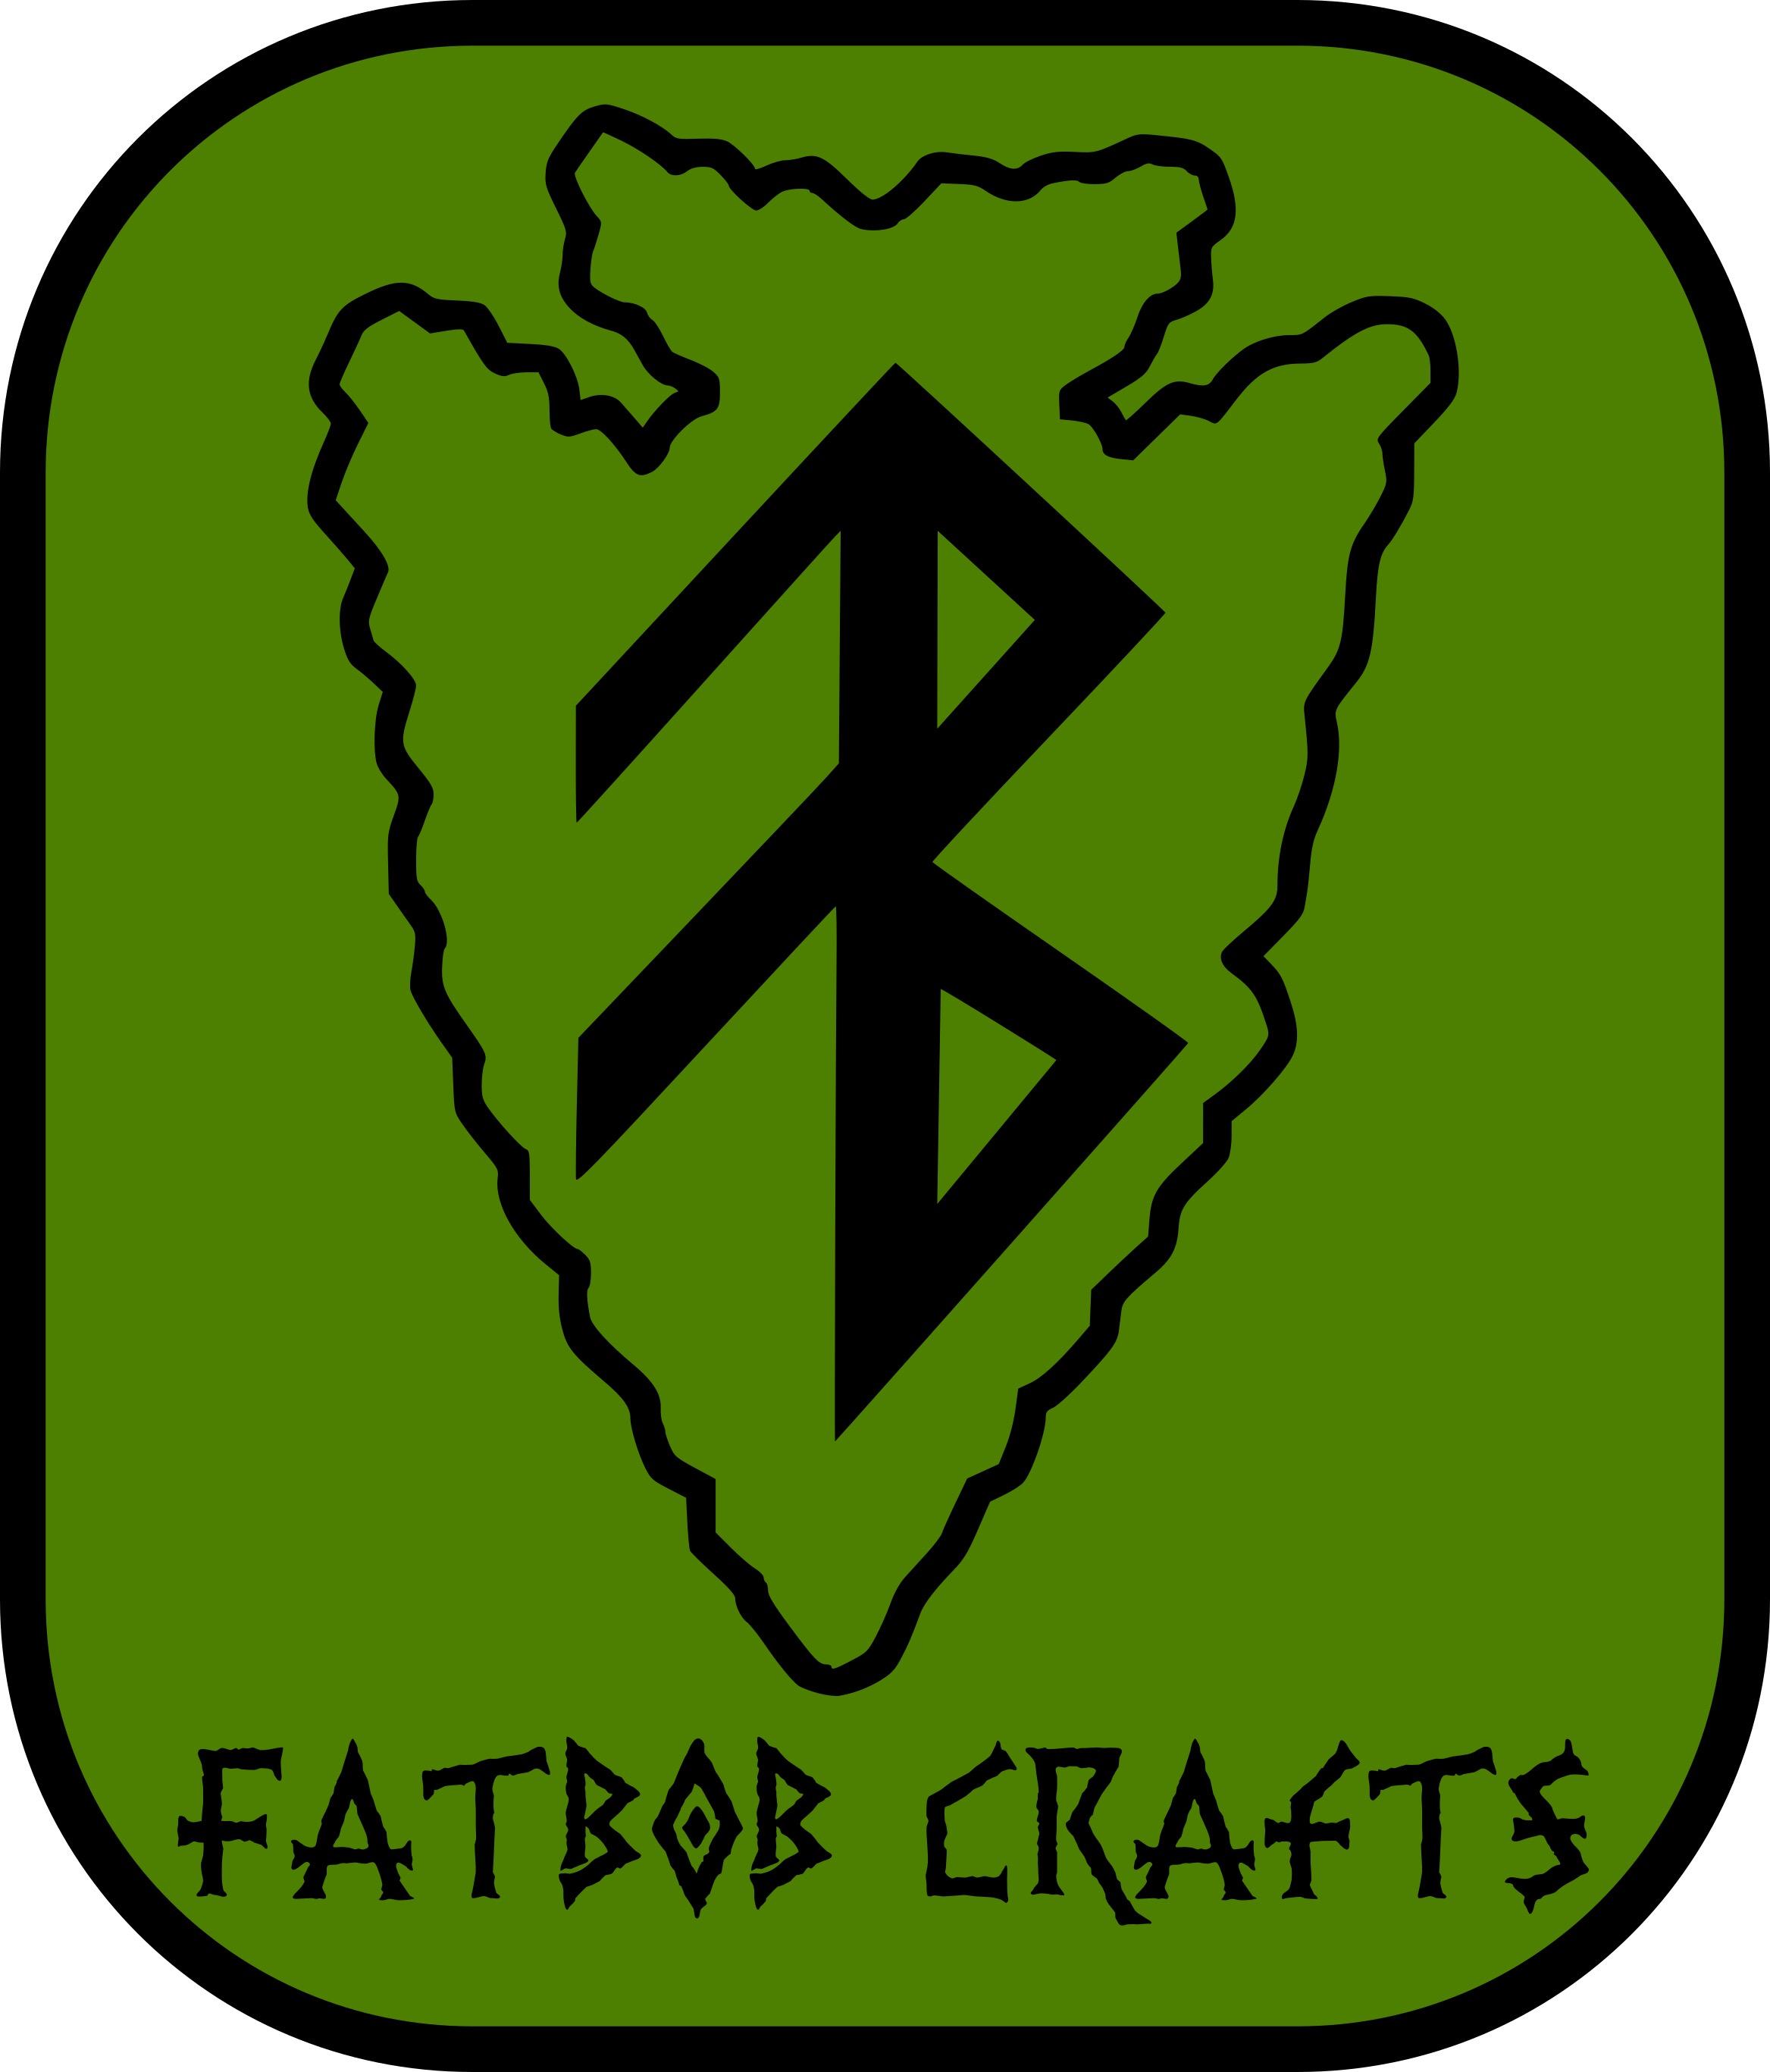 fatbob_crafts.jpeg